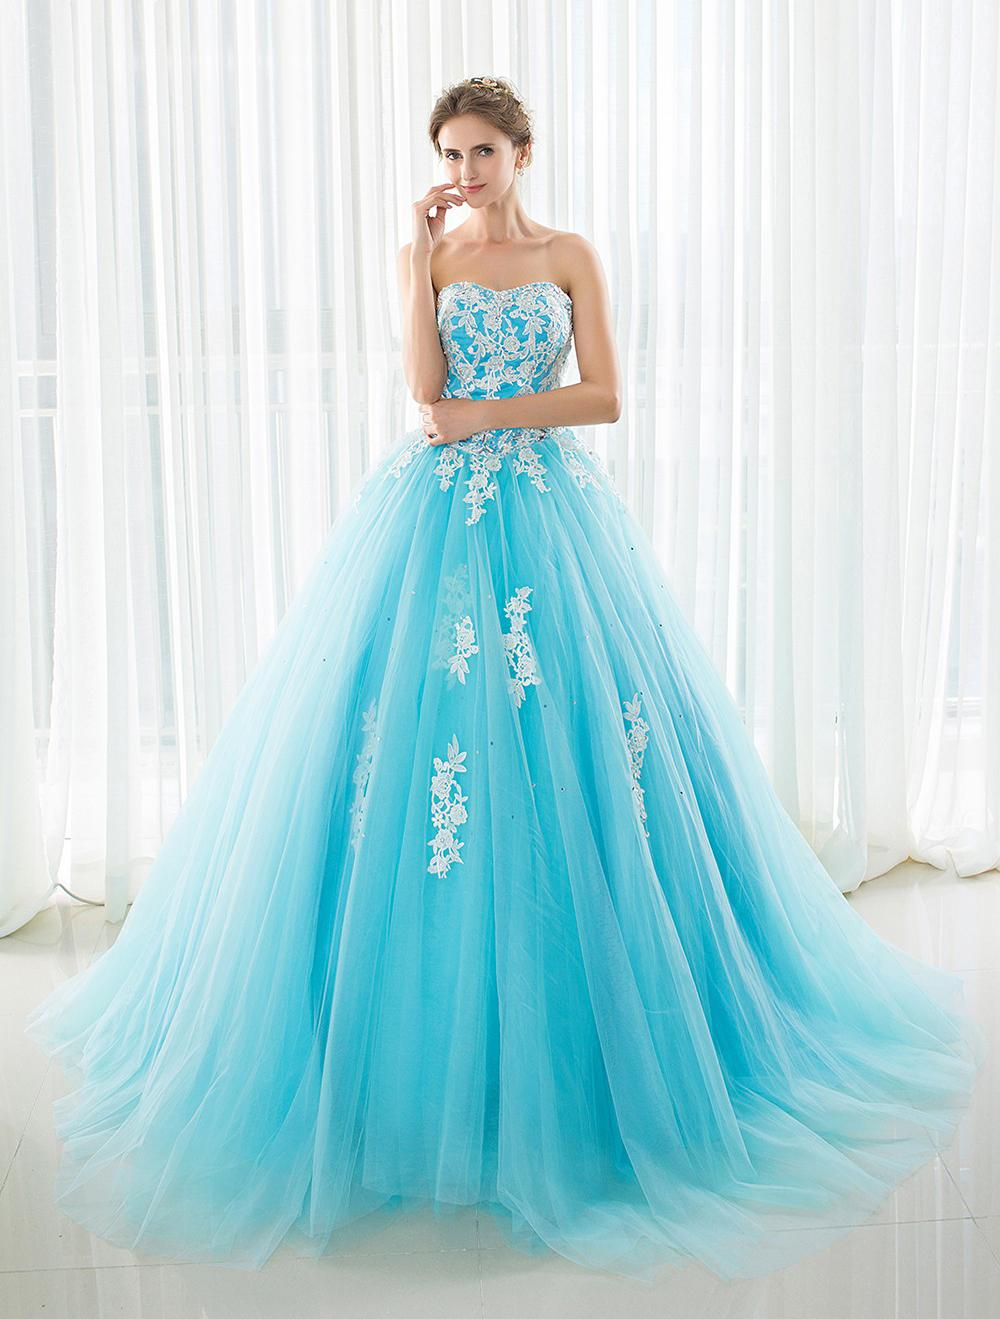 062d59535 Vestidos De Festa Para Casamento 2019 Vestido De Baile Vestidos De Baile  Longo Tule Vestidos Quinceanera Puffy Vestidos 15 Anos Branco Rendas  Apliques Doce ...